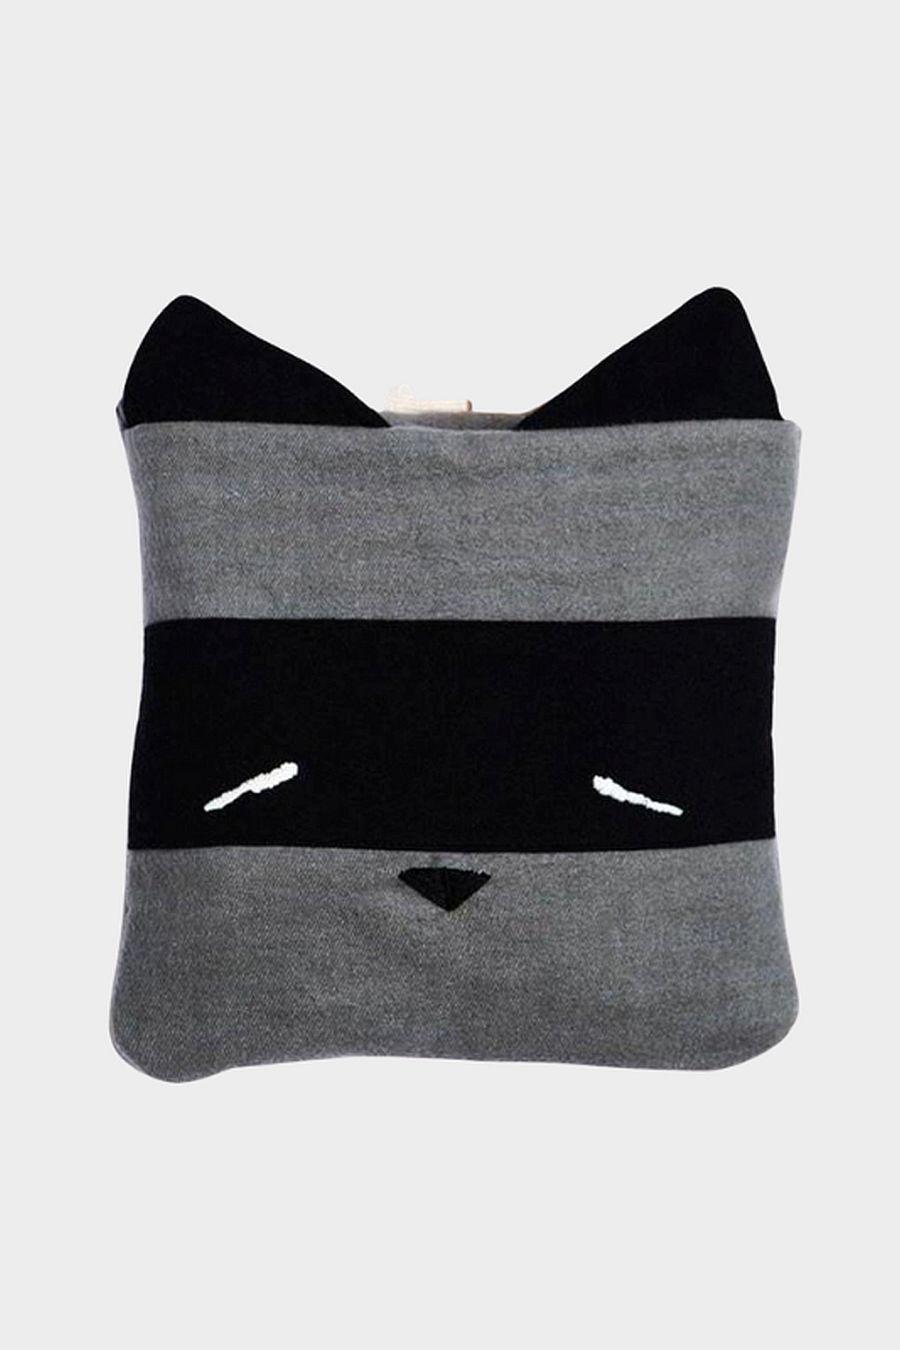 Ellie Funday Lewis The Raccoon Nomad Travel Blanket